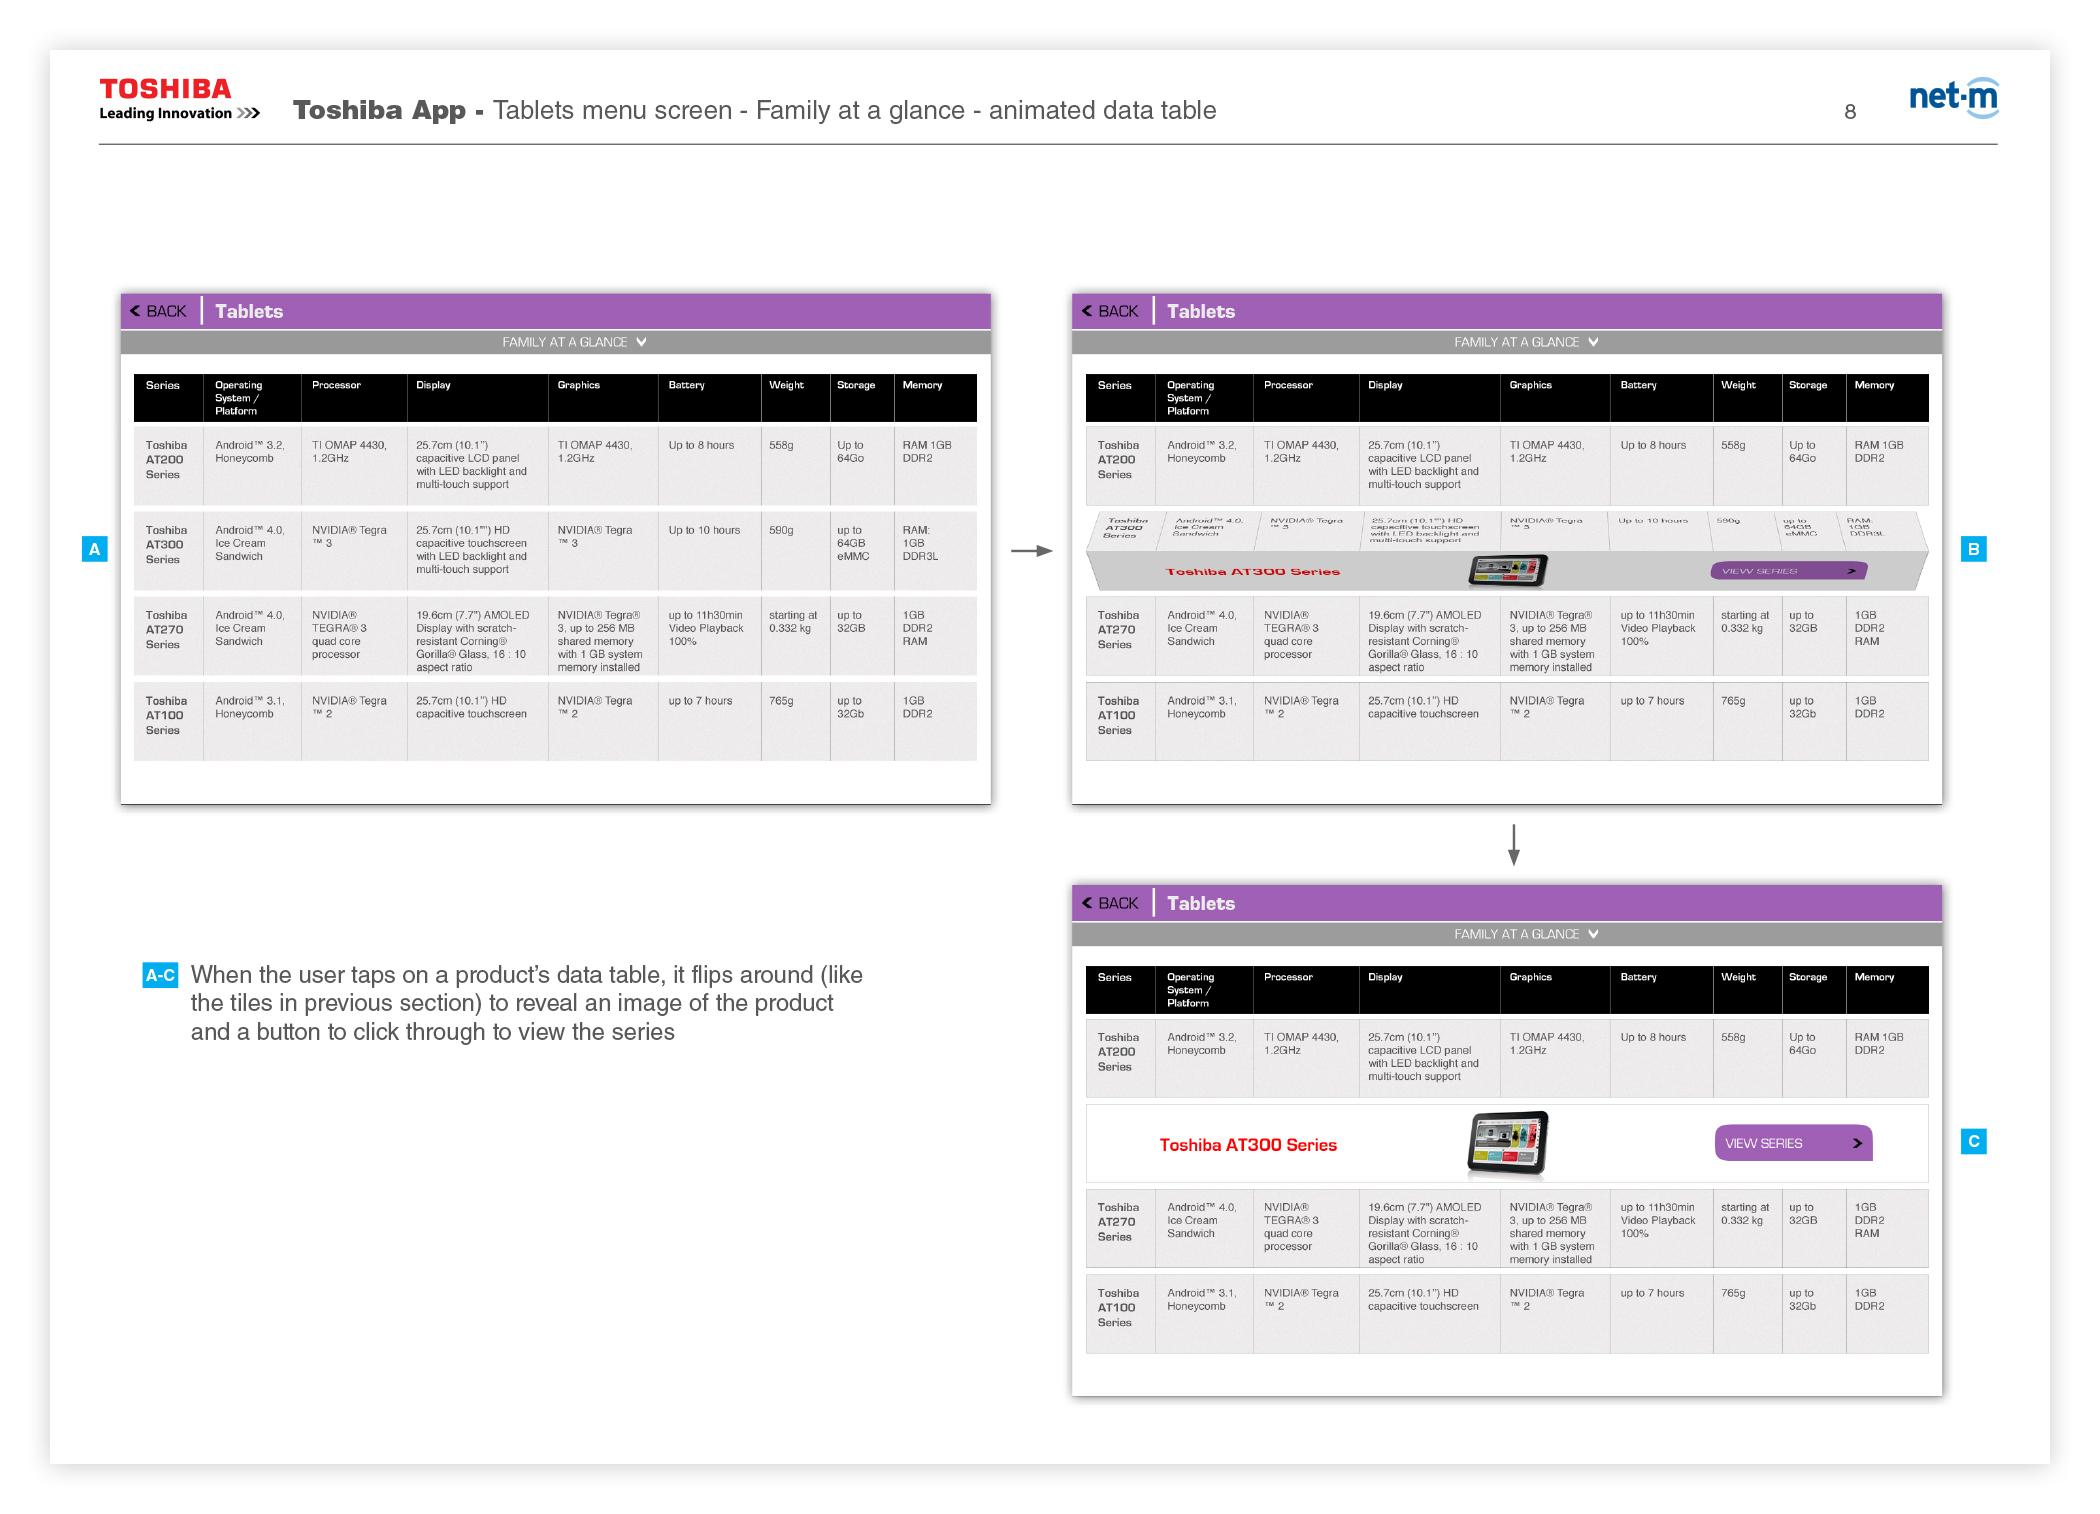 Toshiba_App_presentation_deck5.jpg